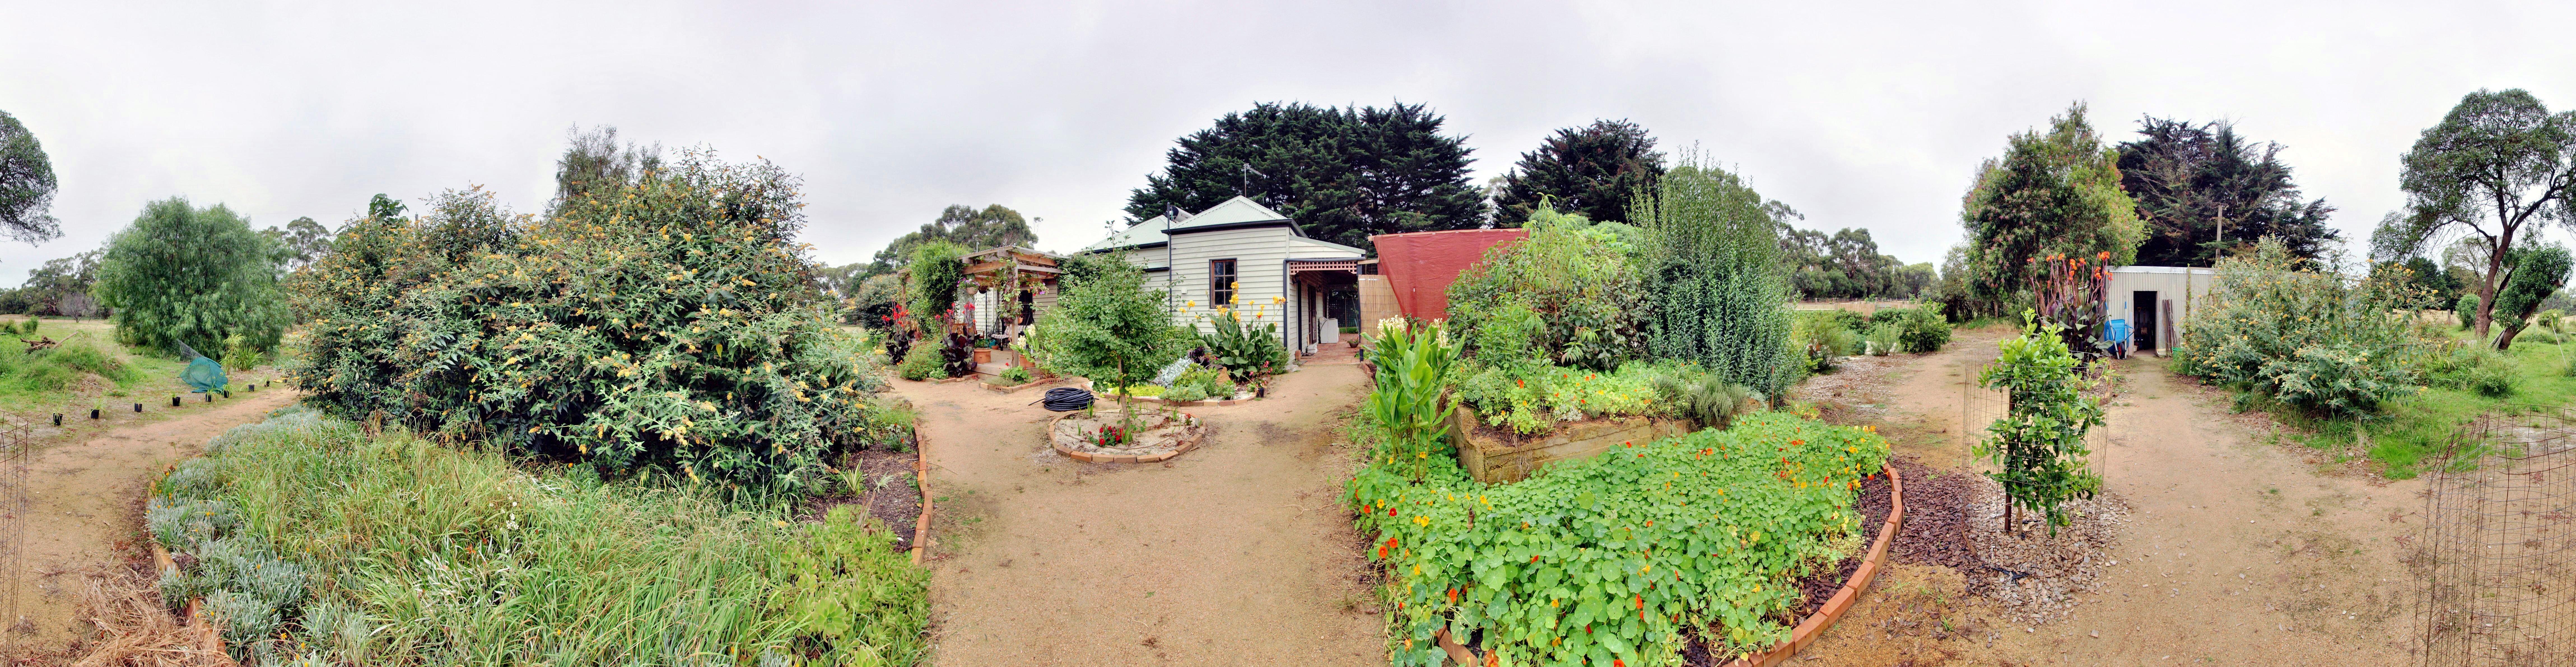 verandah-ne-panorama.jpeg